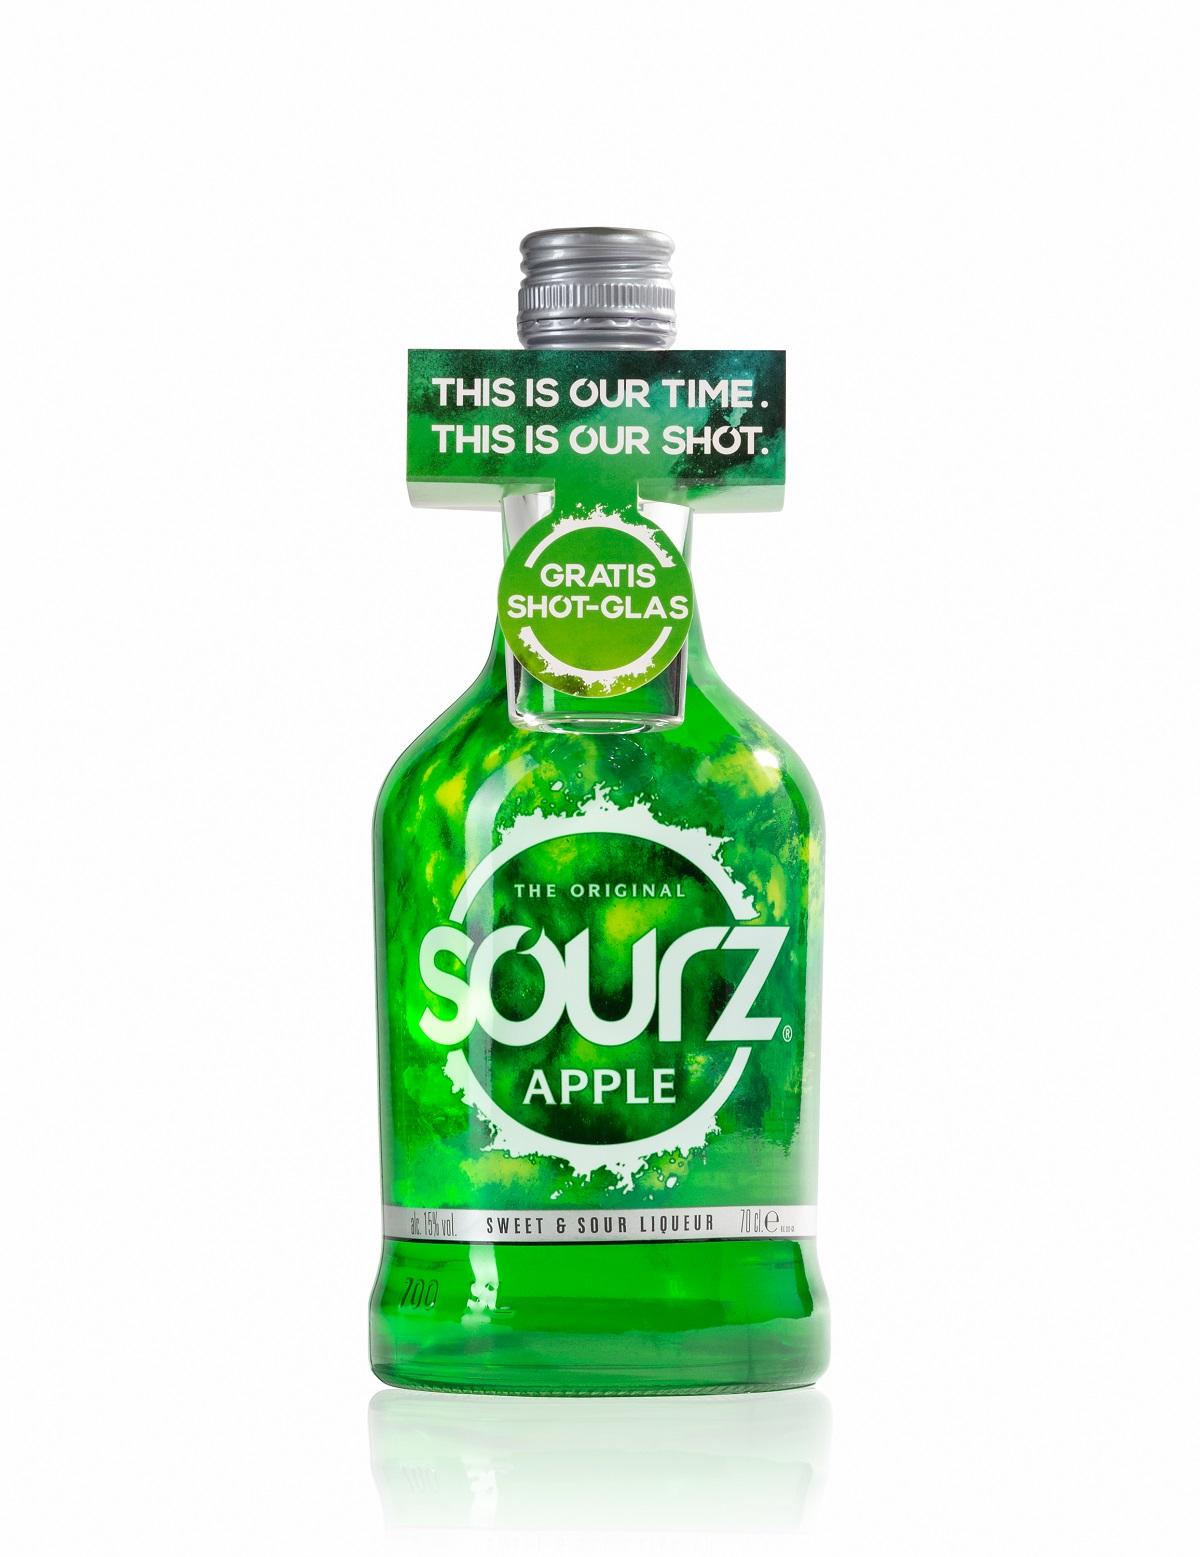 2020 08 14 SHMDSGN Sourz Bottle Shm PM3A9944 Bearbeitet